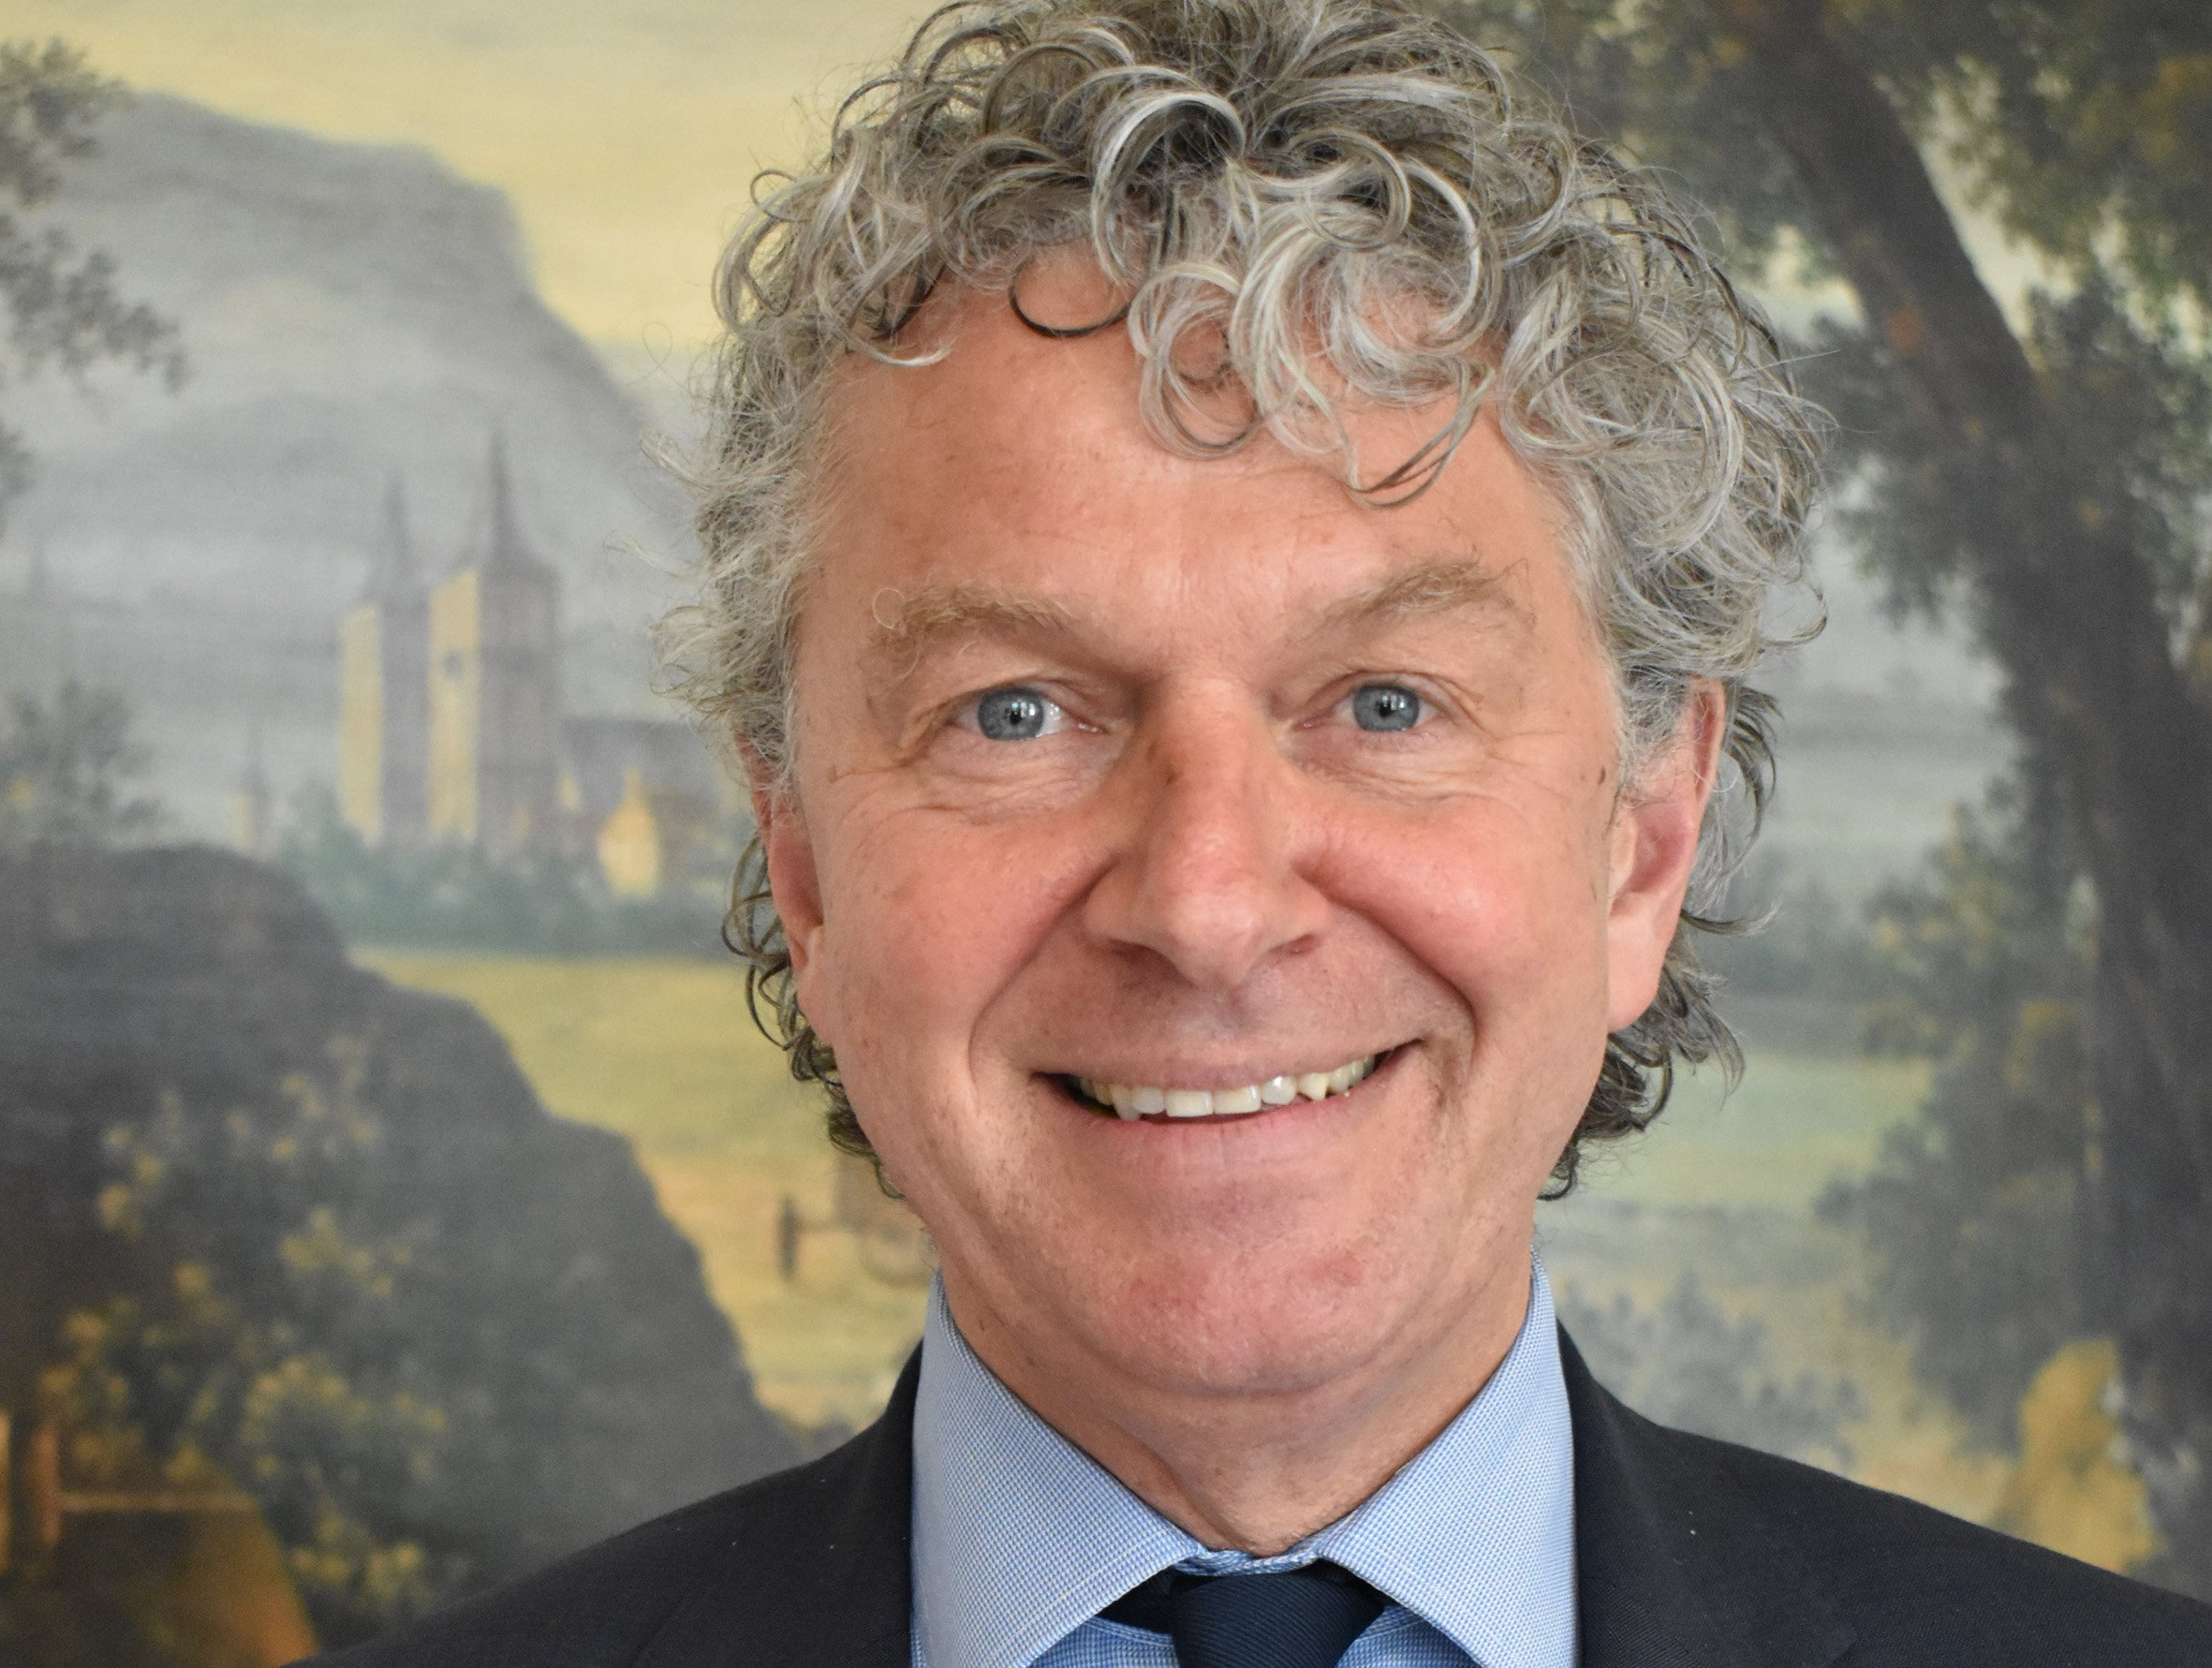 Jacques Monasch nieuwe voorzitter stichting ERM